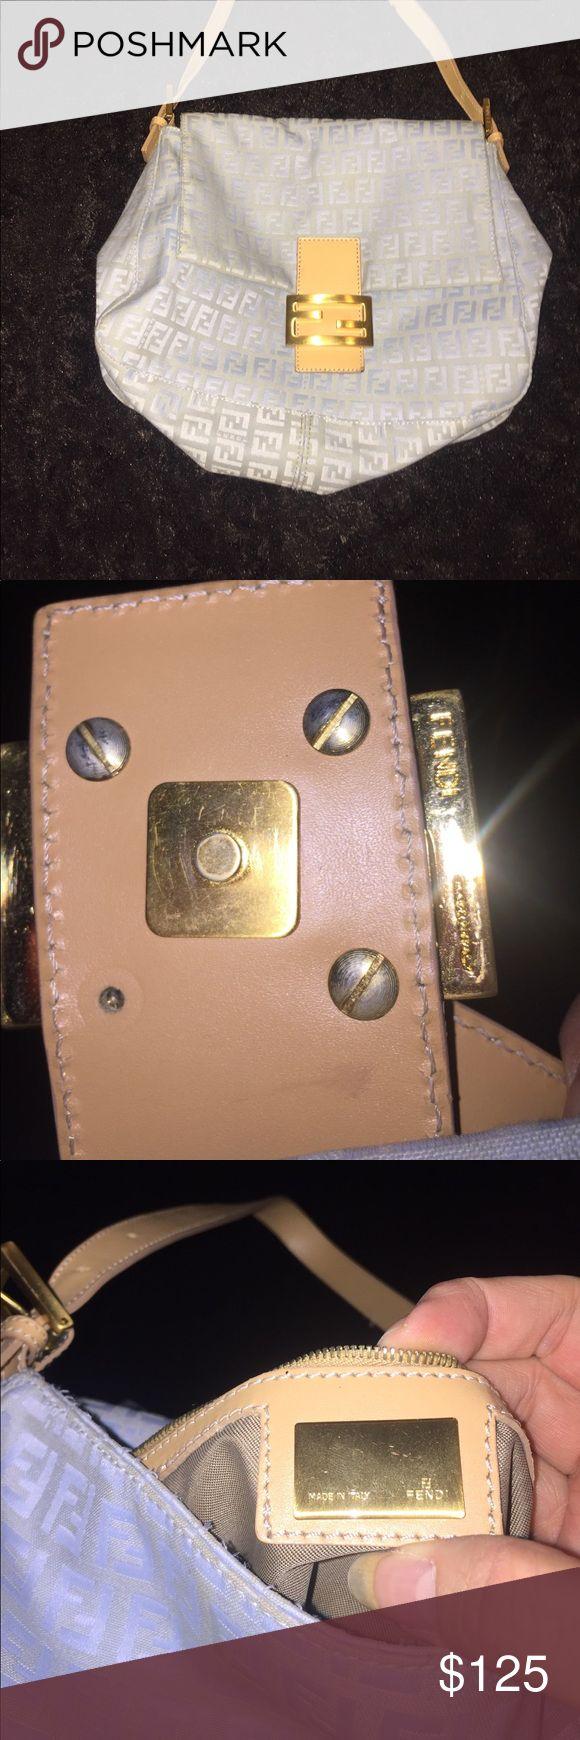 Blue Fendi purse This is a rare color Fendi shoulder handbag. In great shape and 100% authentic. Fendi Bags Shoulder Bags